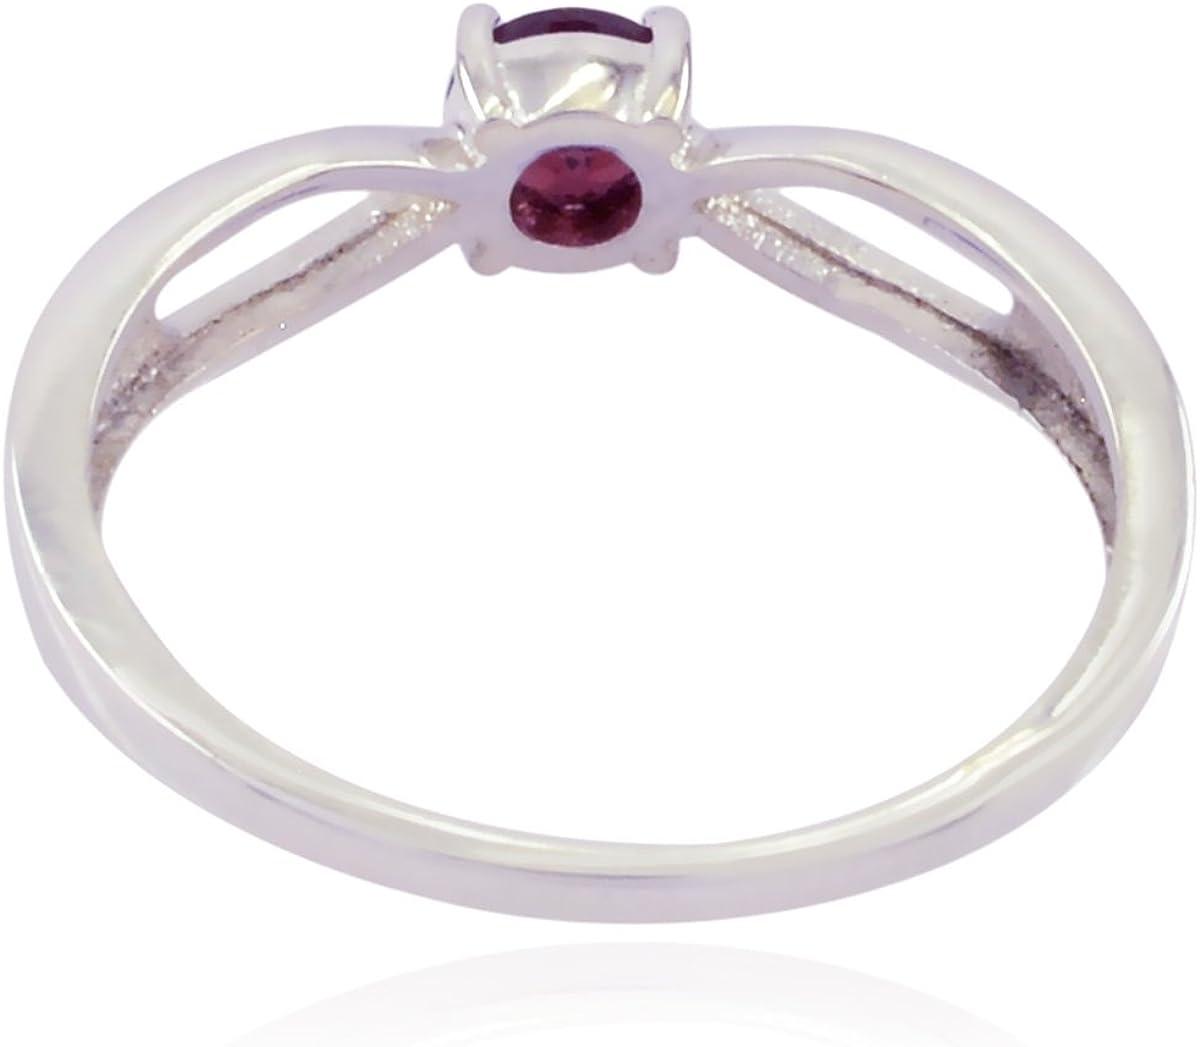 Good Gemstones Round Faceted Garnet Rings 925 Silver Red Garnet Good Gemstones Ring Faishon Jewelry Great Seller Gift for Valentines Day Handmade Rings